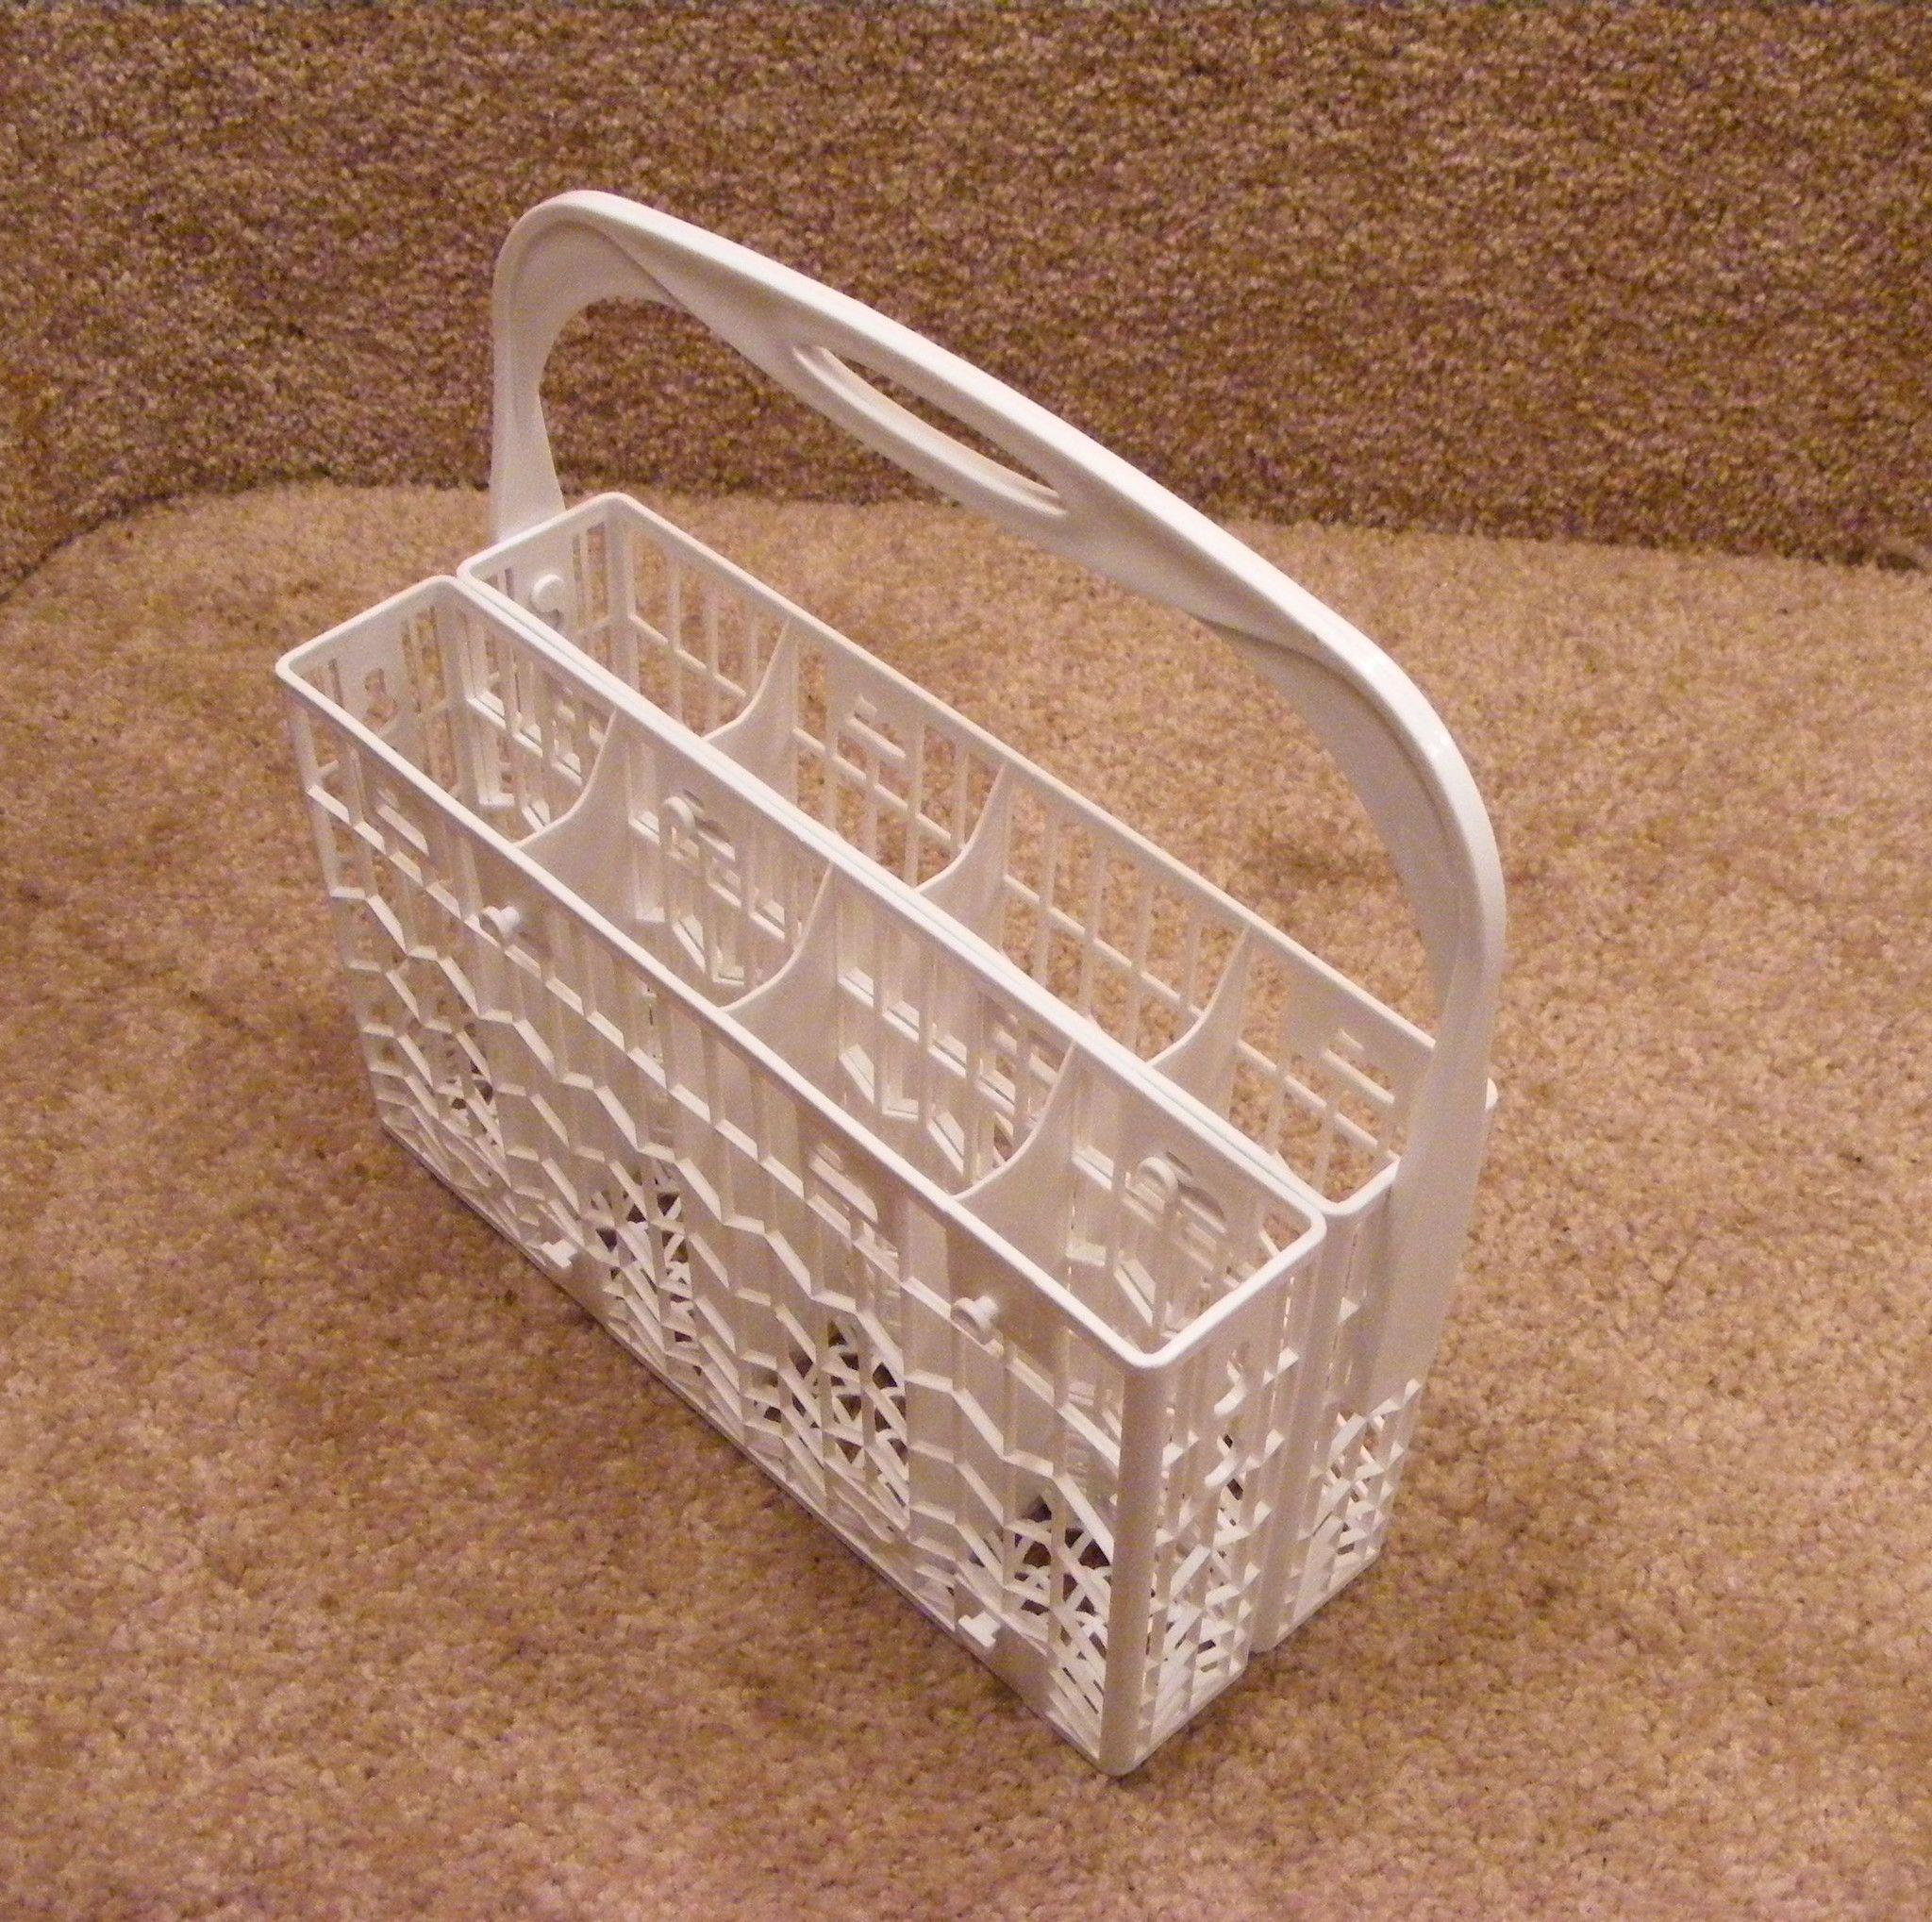 Danby Dishwasher Silverware Basket